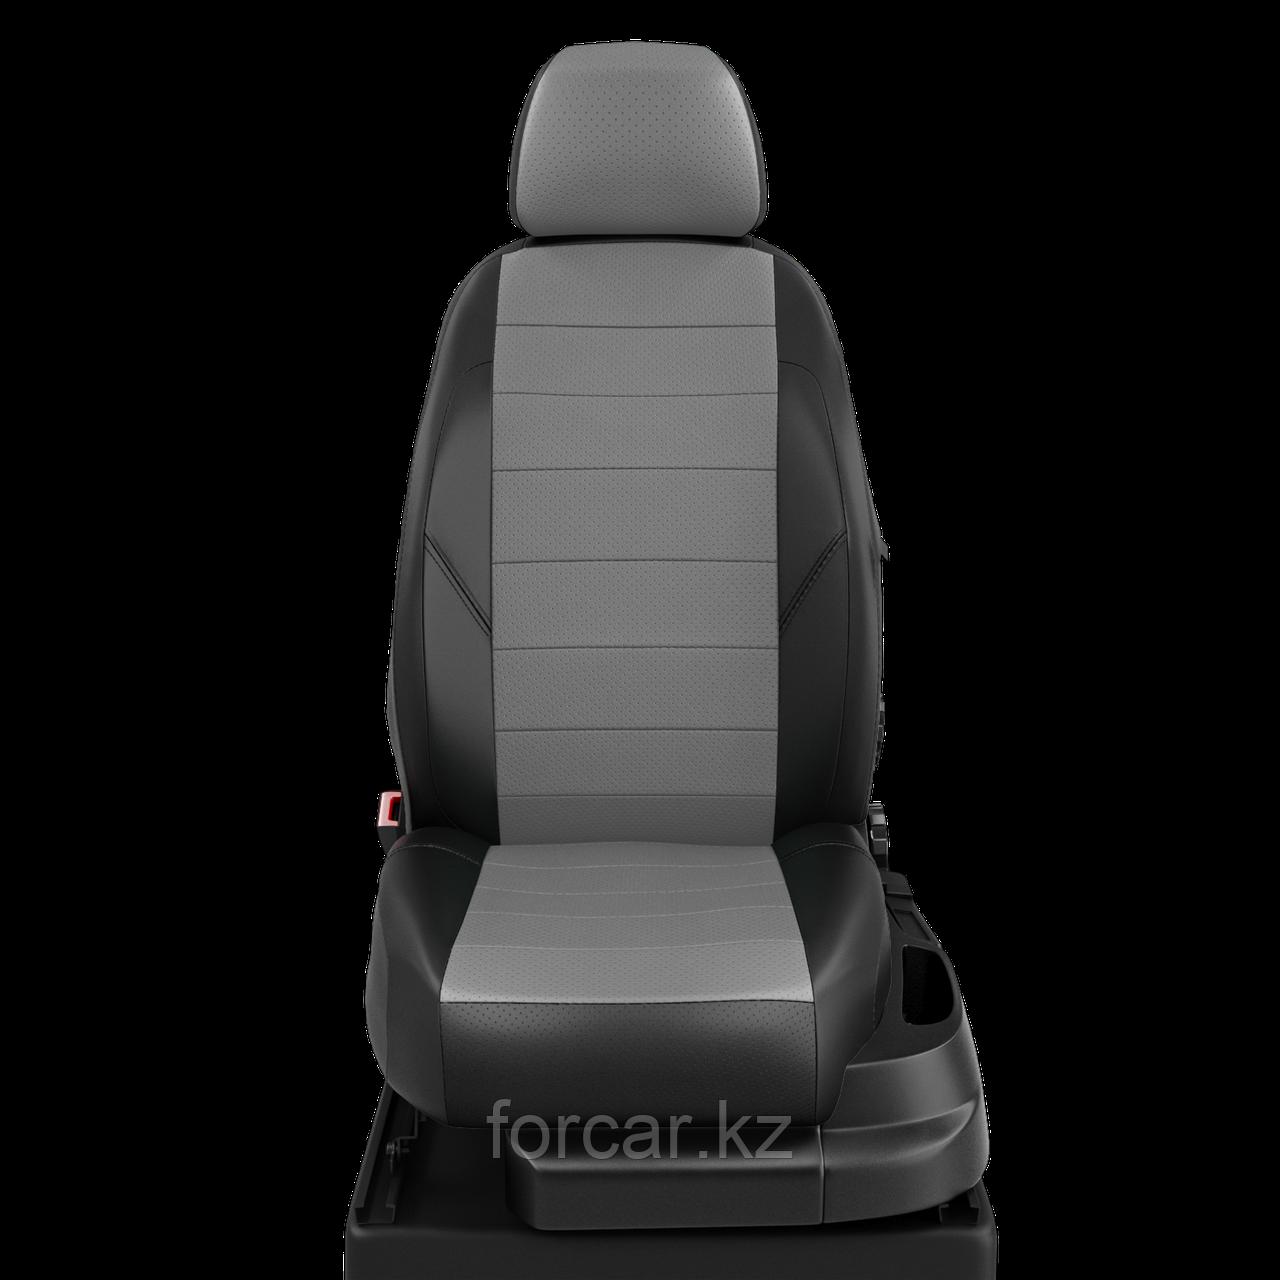 Авточехлы для Nissan X-trail NEW с 2015-н.в. джип Т-32